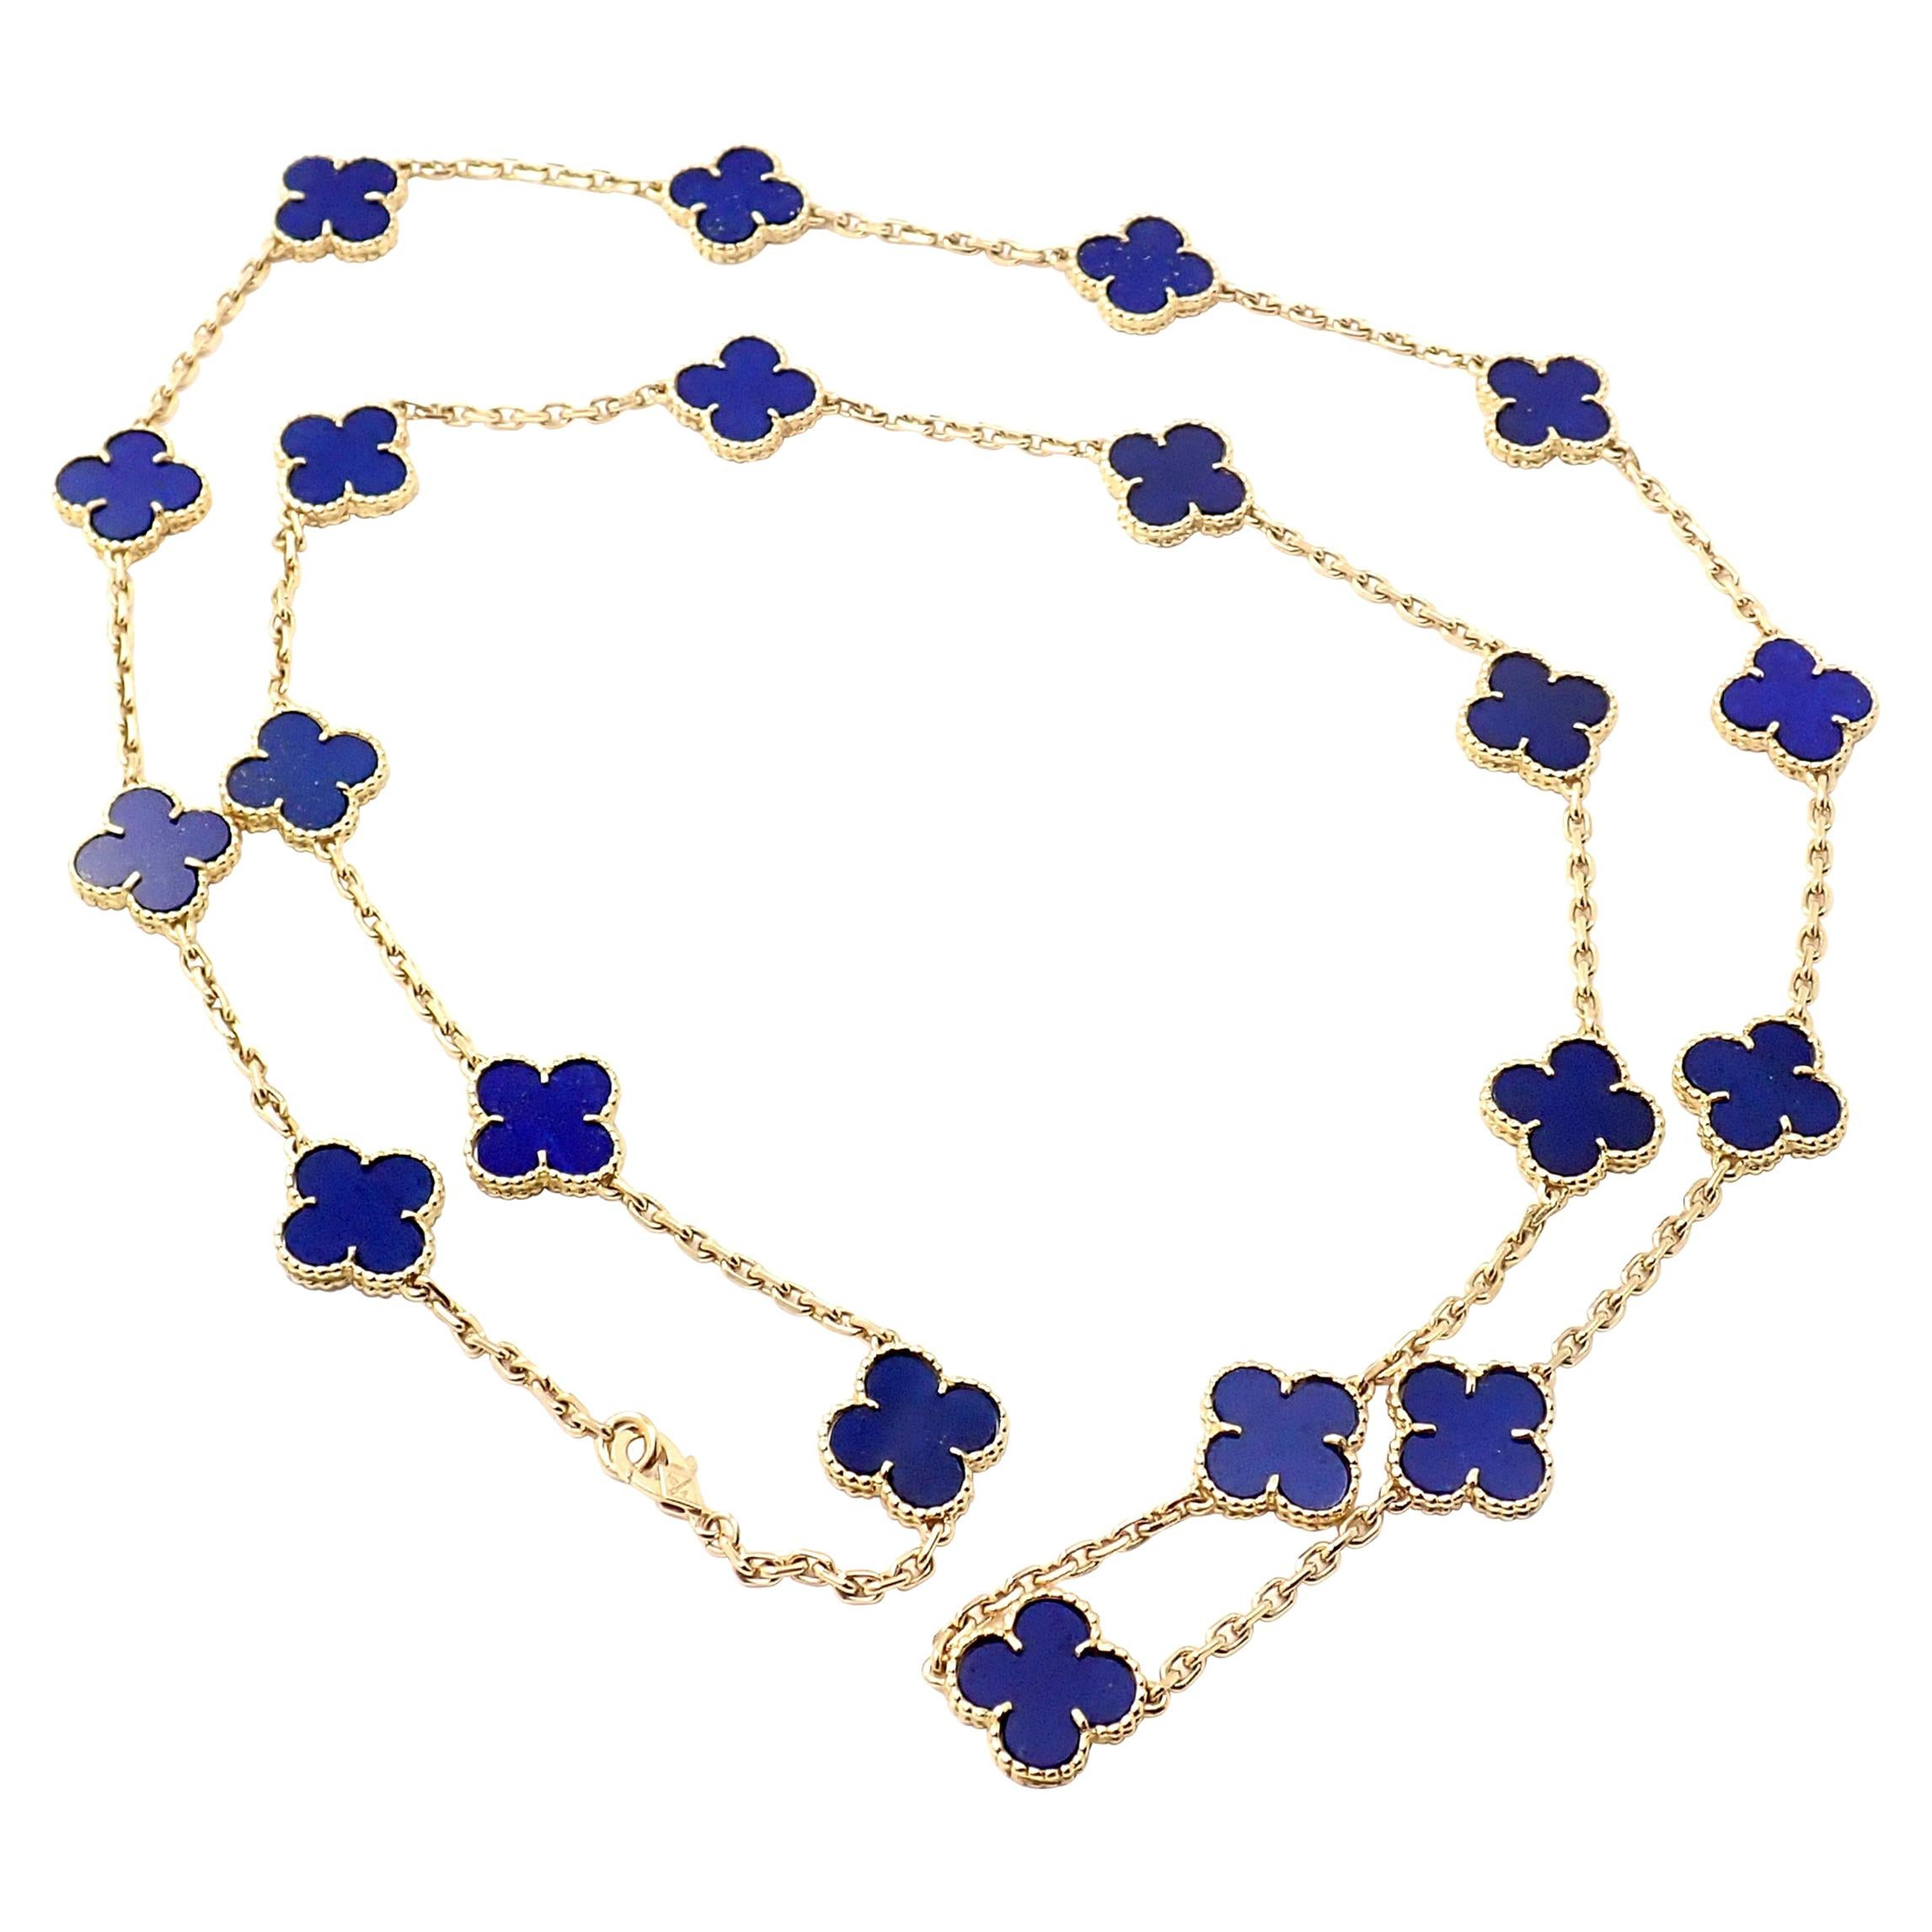 Van Cleef & Arpels Vintage Alhambra Lapis Lazuli 20 Motif Yellow Gold Necklace